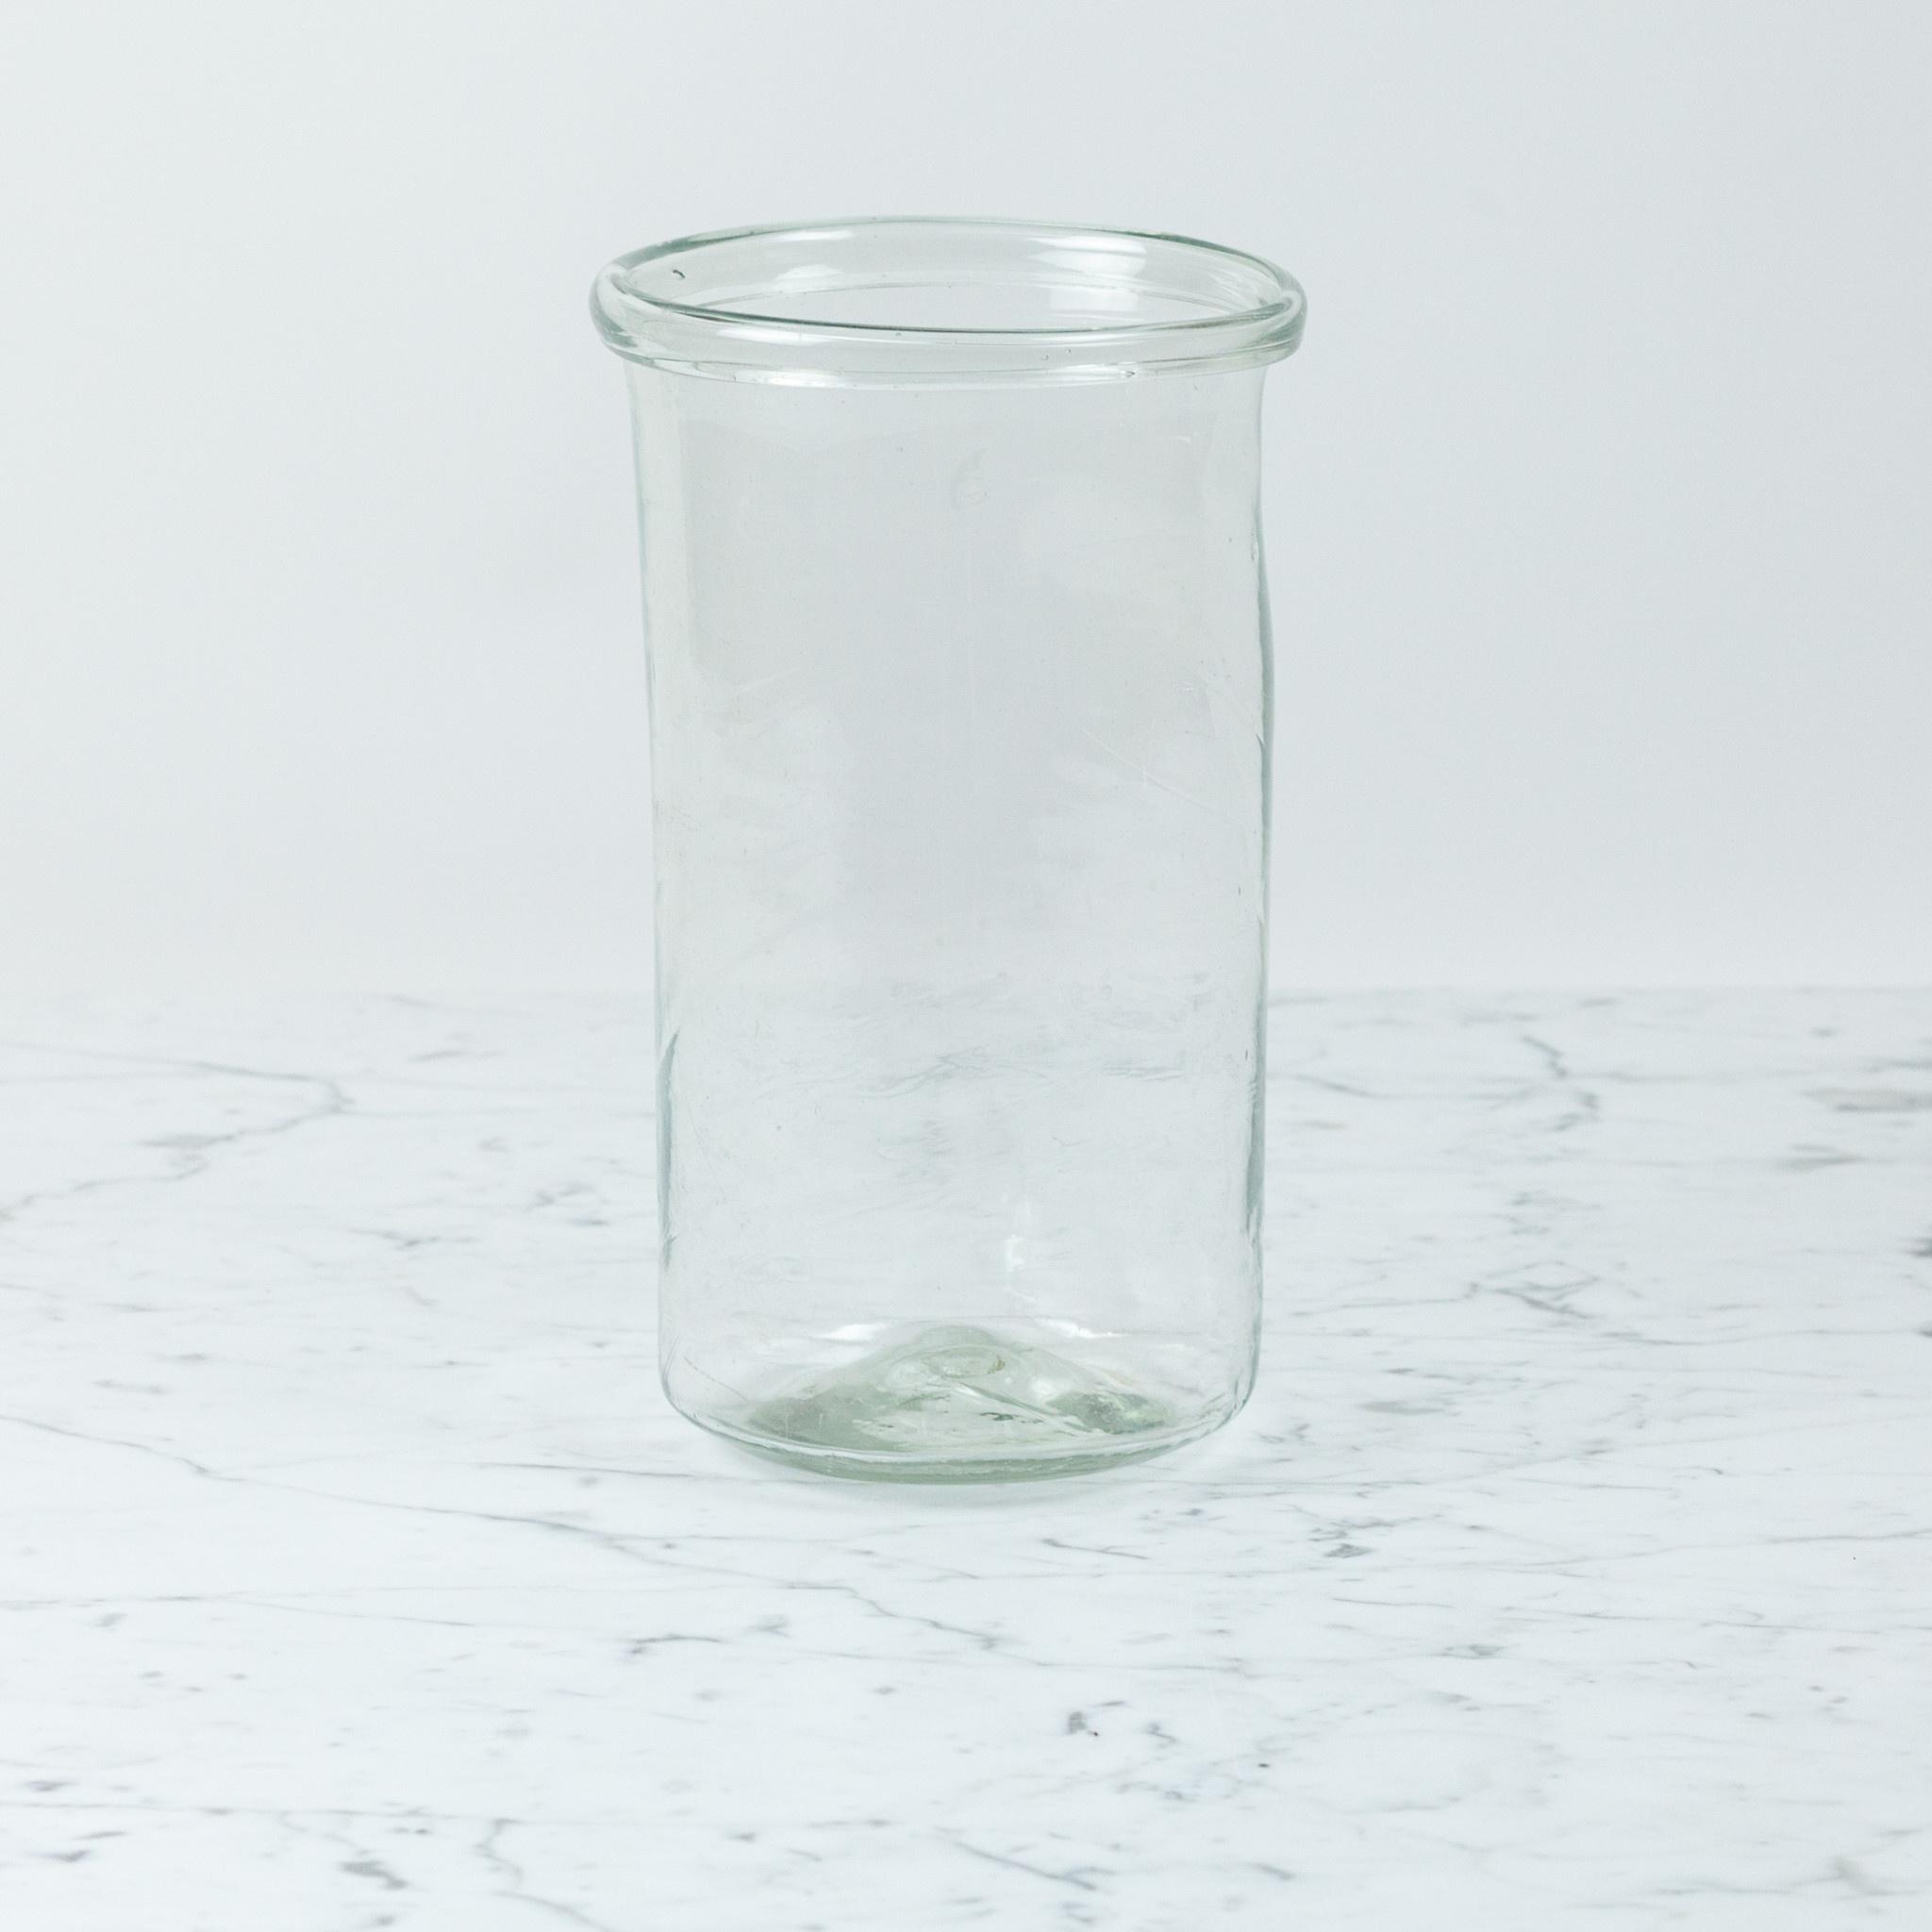 La Soufflerie Hand Blown Pot A Cornichon Glass Jar - Large